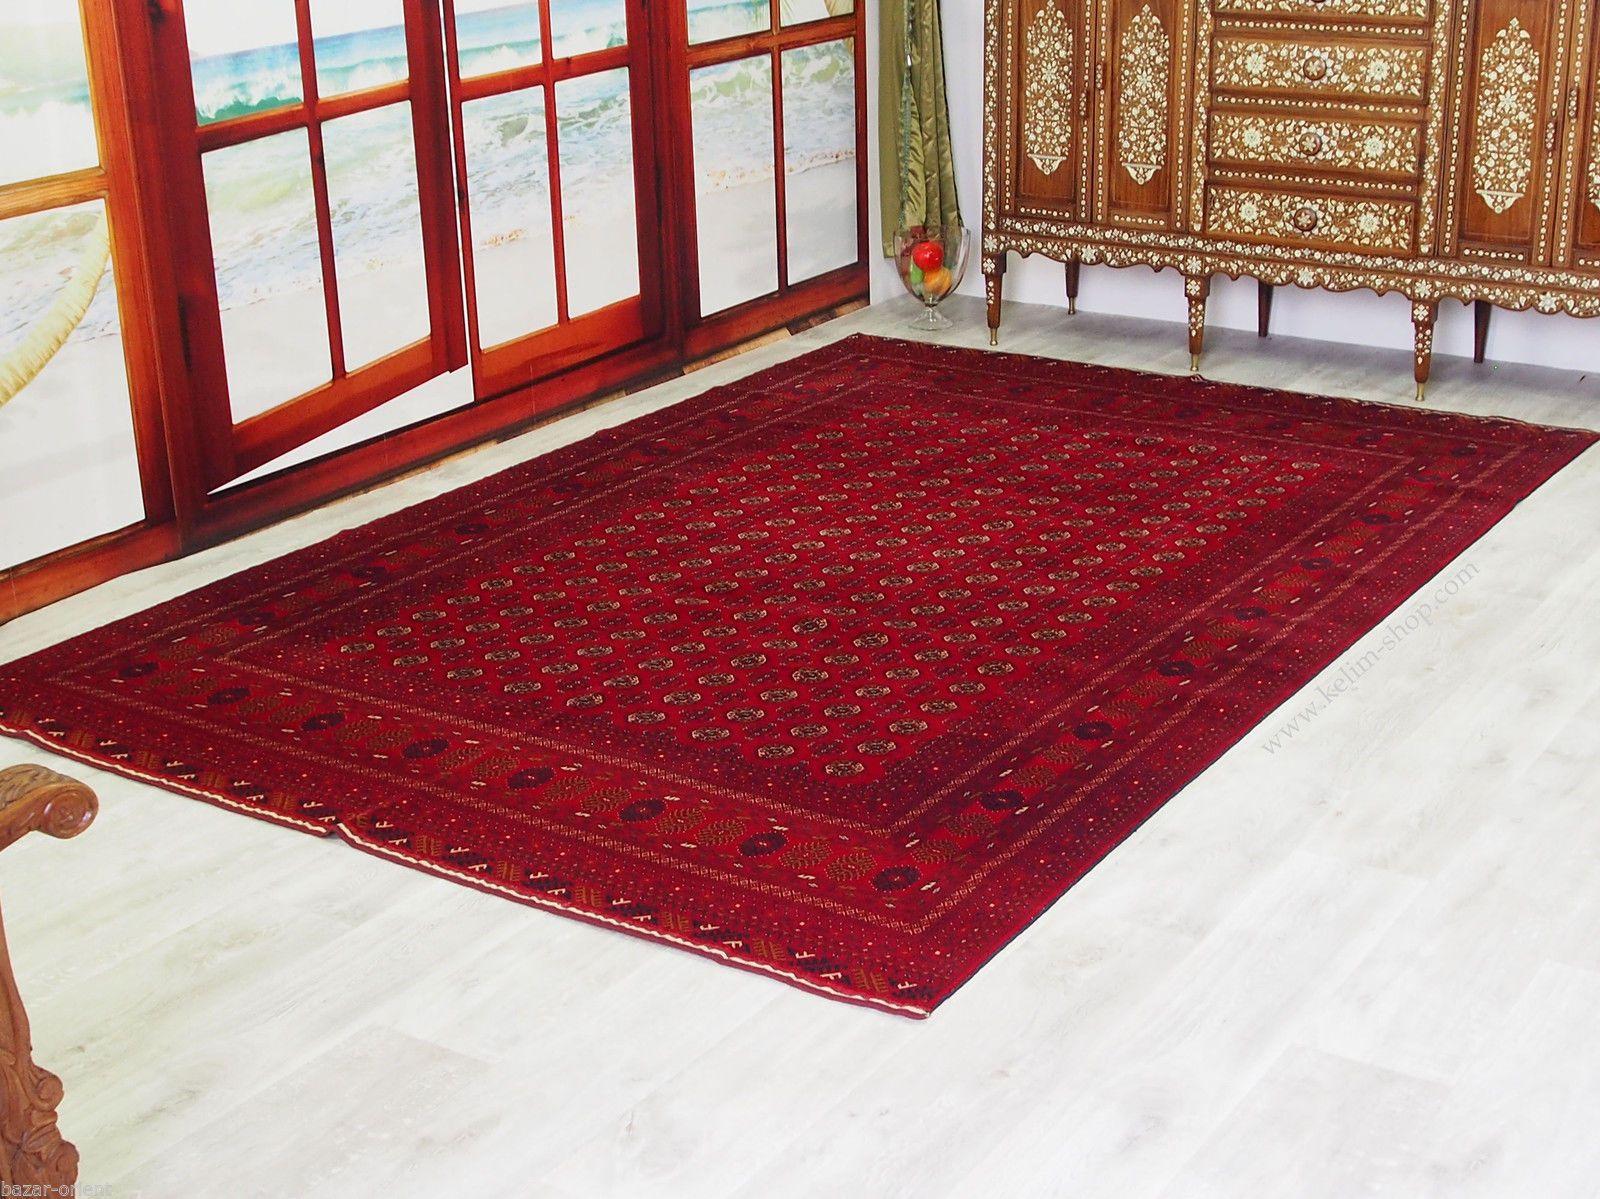 305x200cm Afghan Turkmen Bukhara Orientteppich Rug Carpet Afghanistan Seide 16 7 Ebay